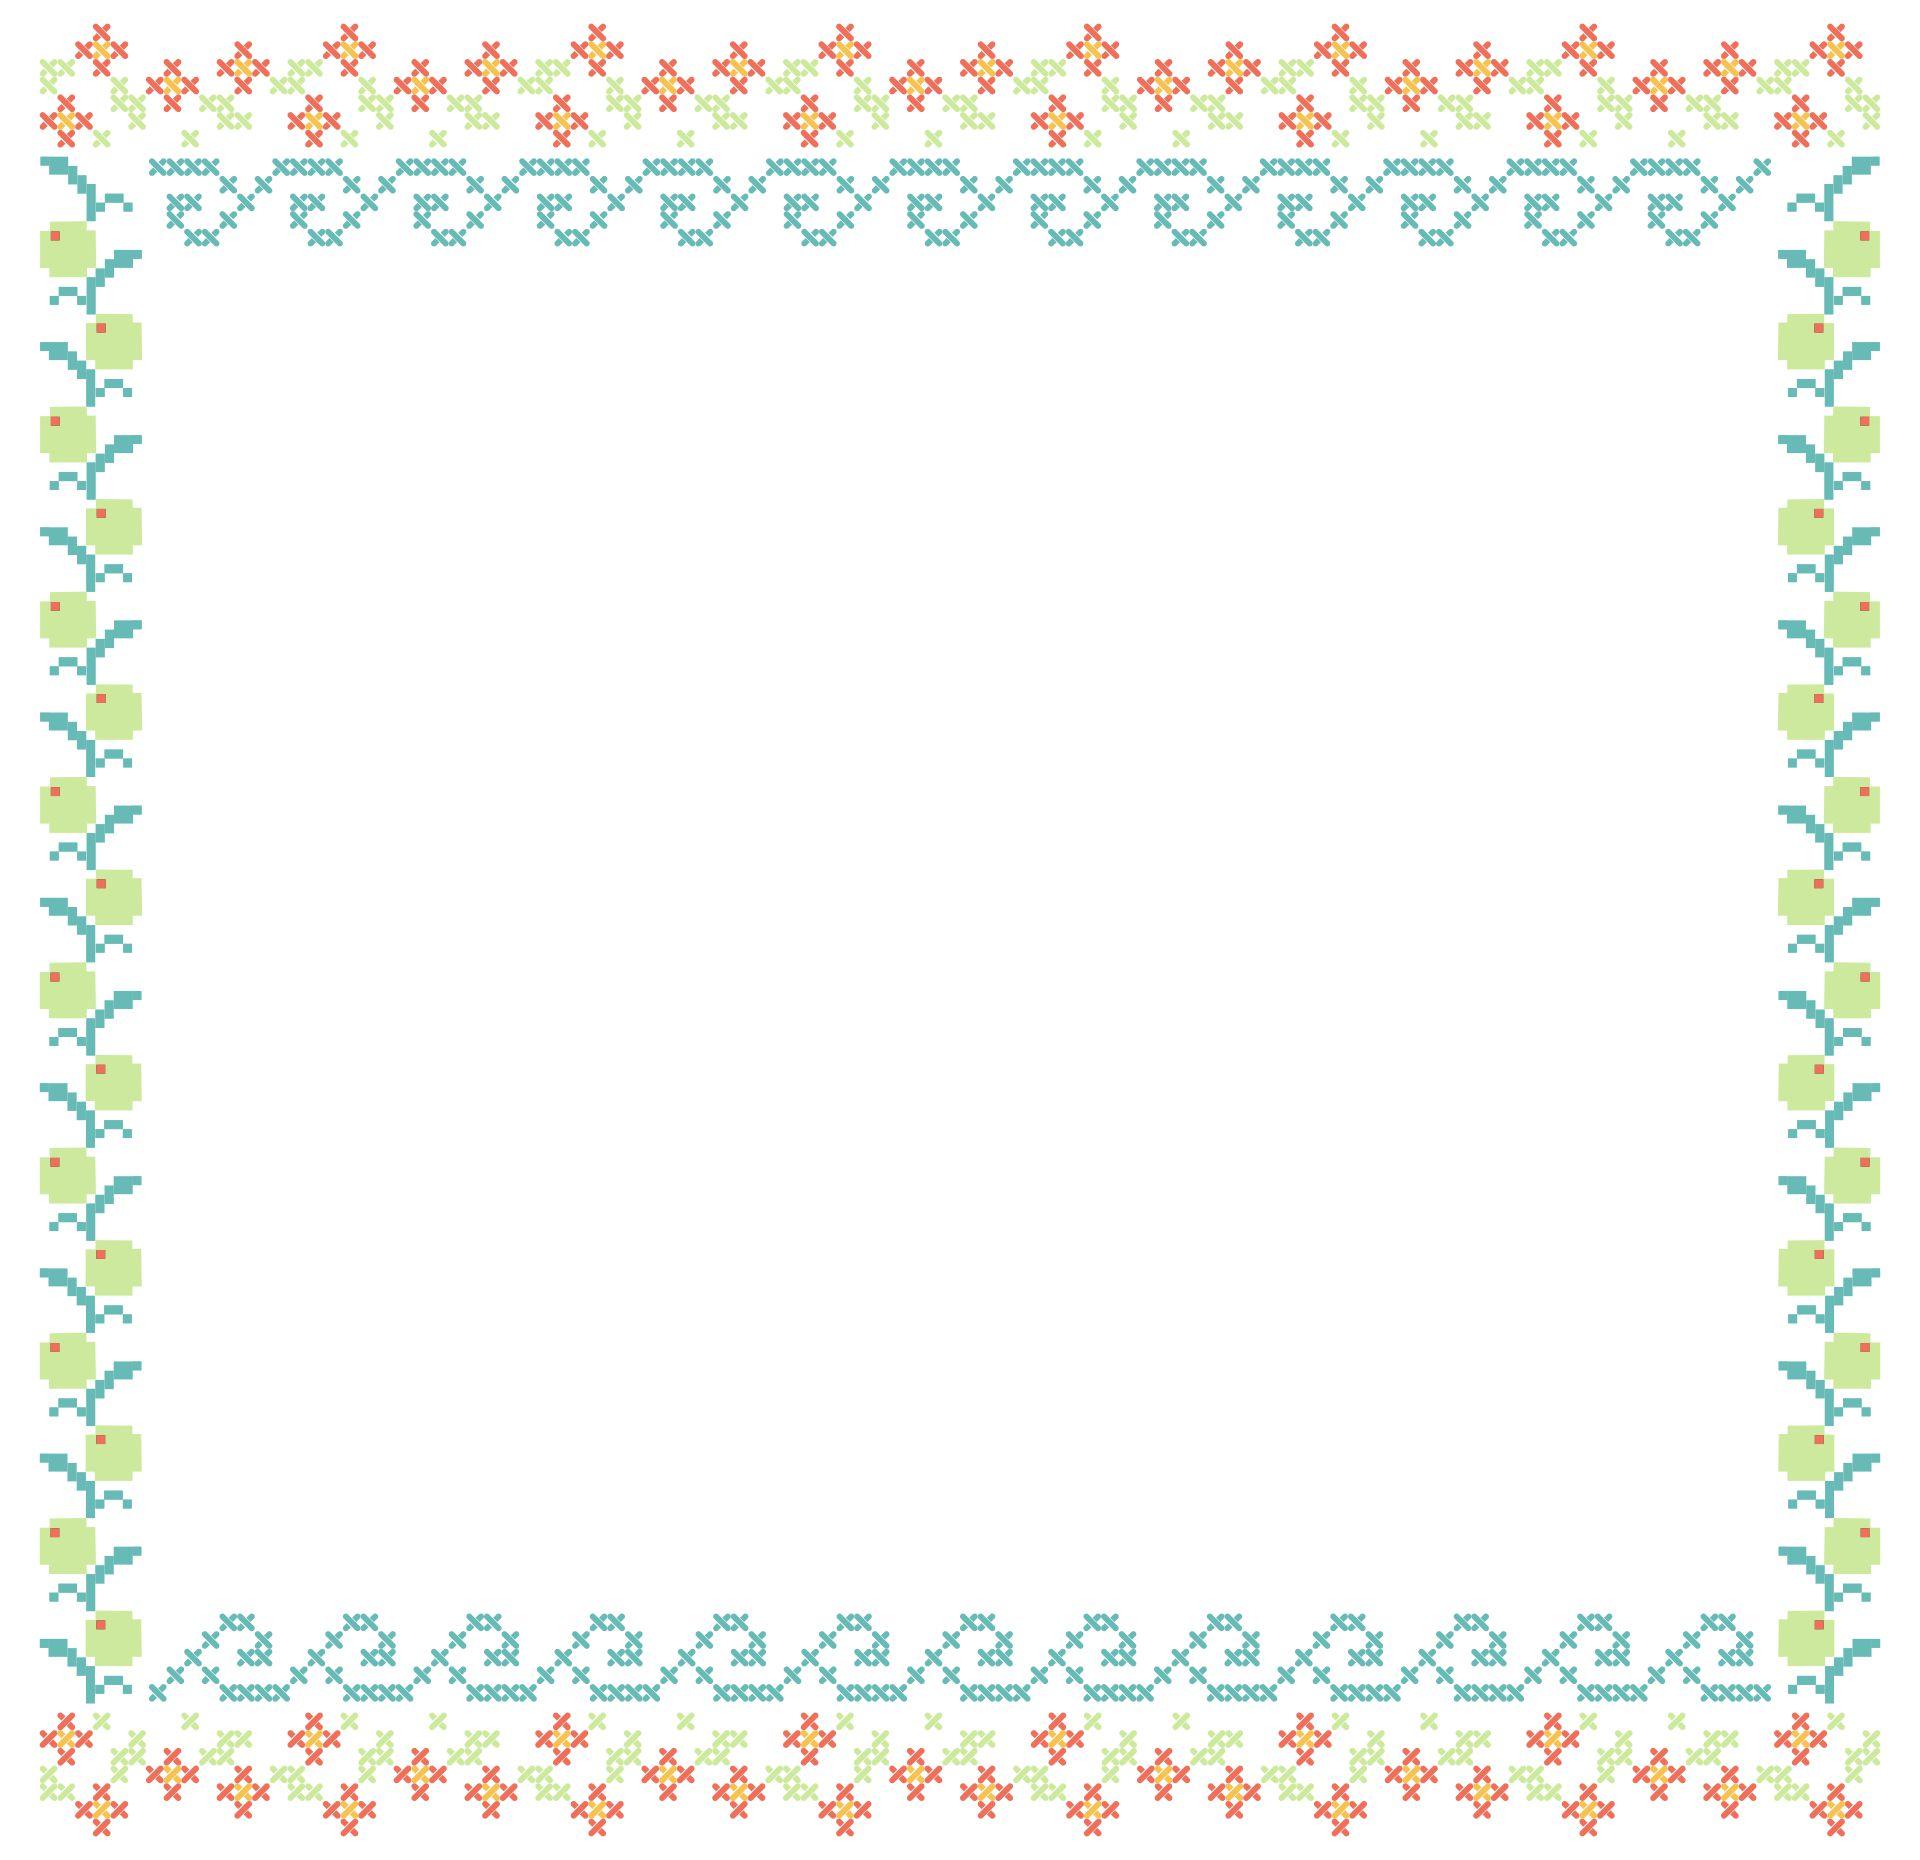 Cross Stitch Border Designs